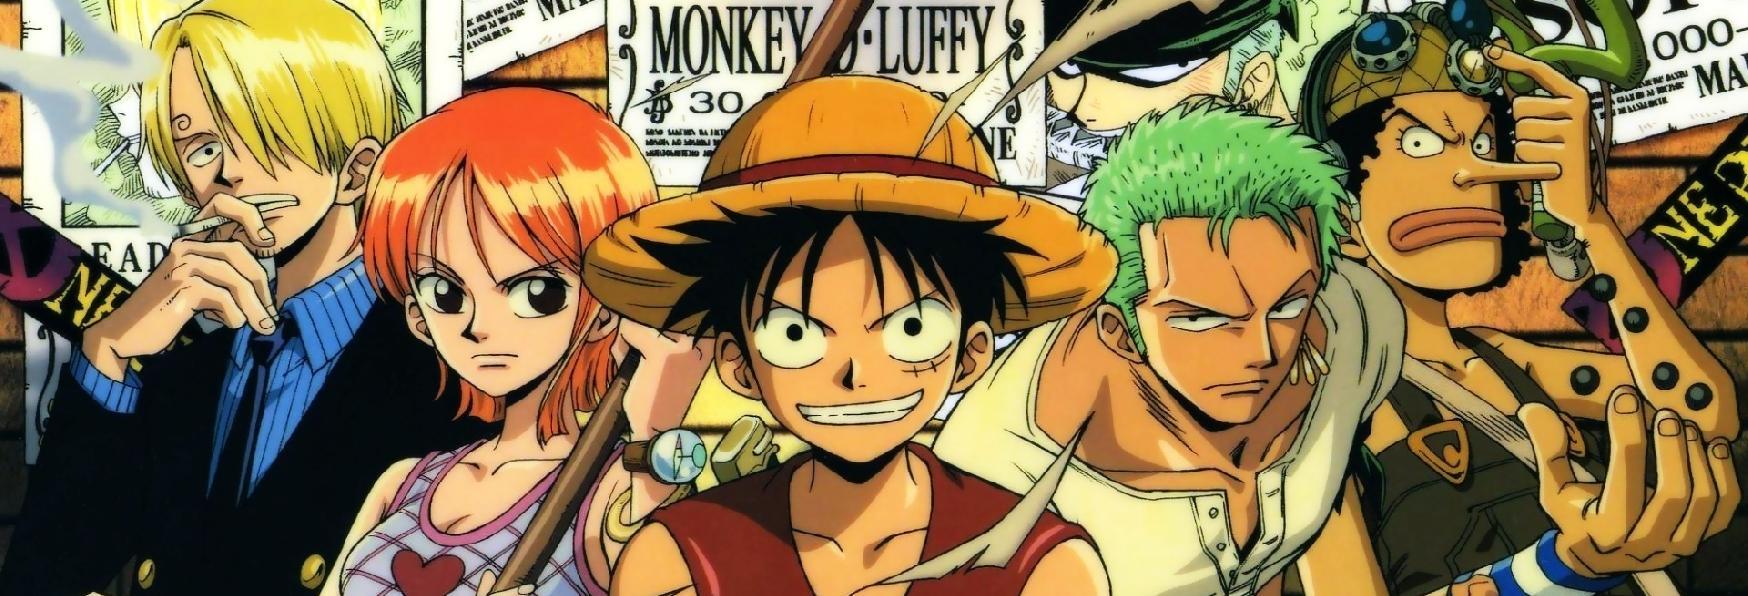 One Piece: presto su Netflix una Nuova Serie TV Live Action?